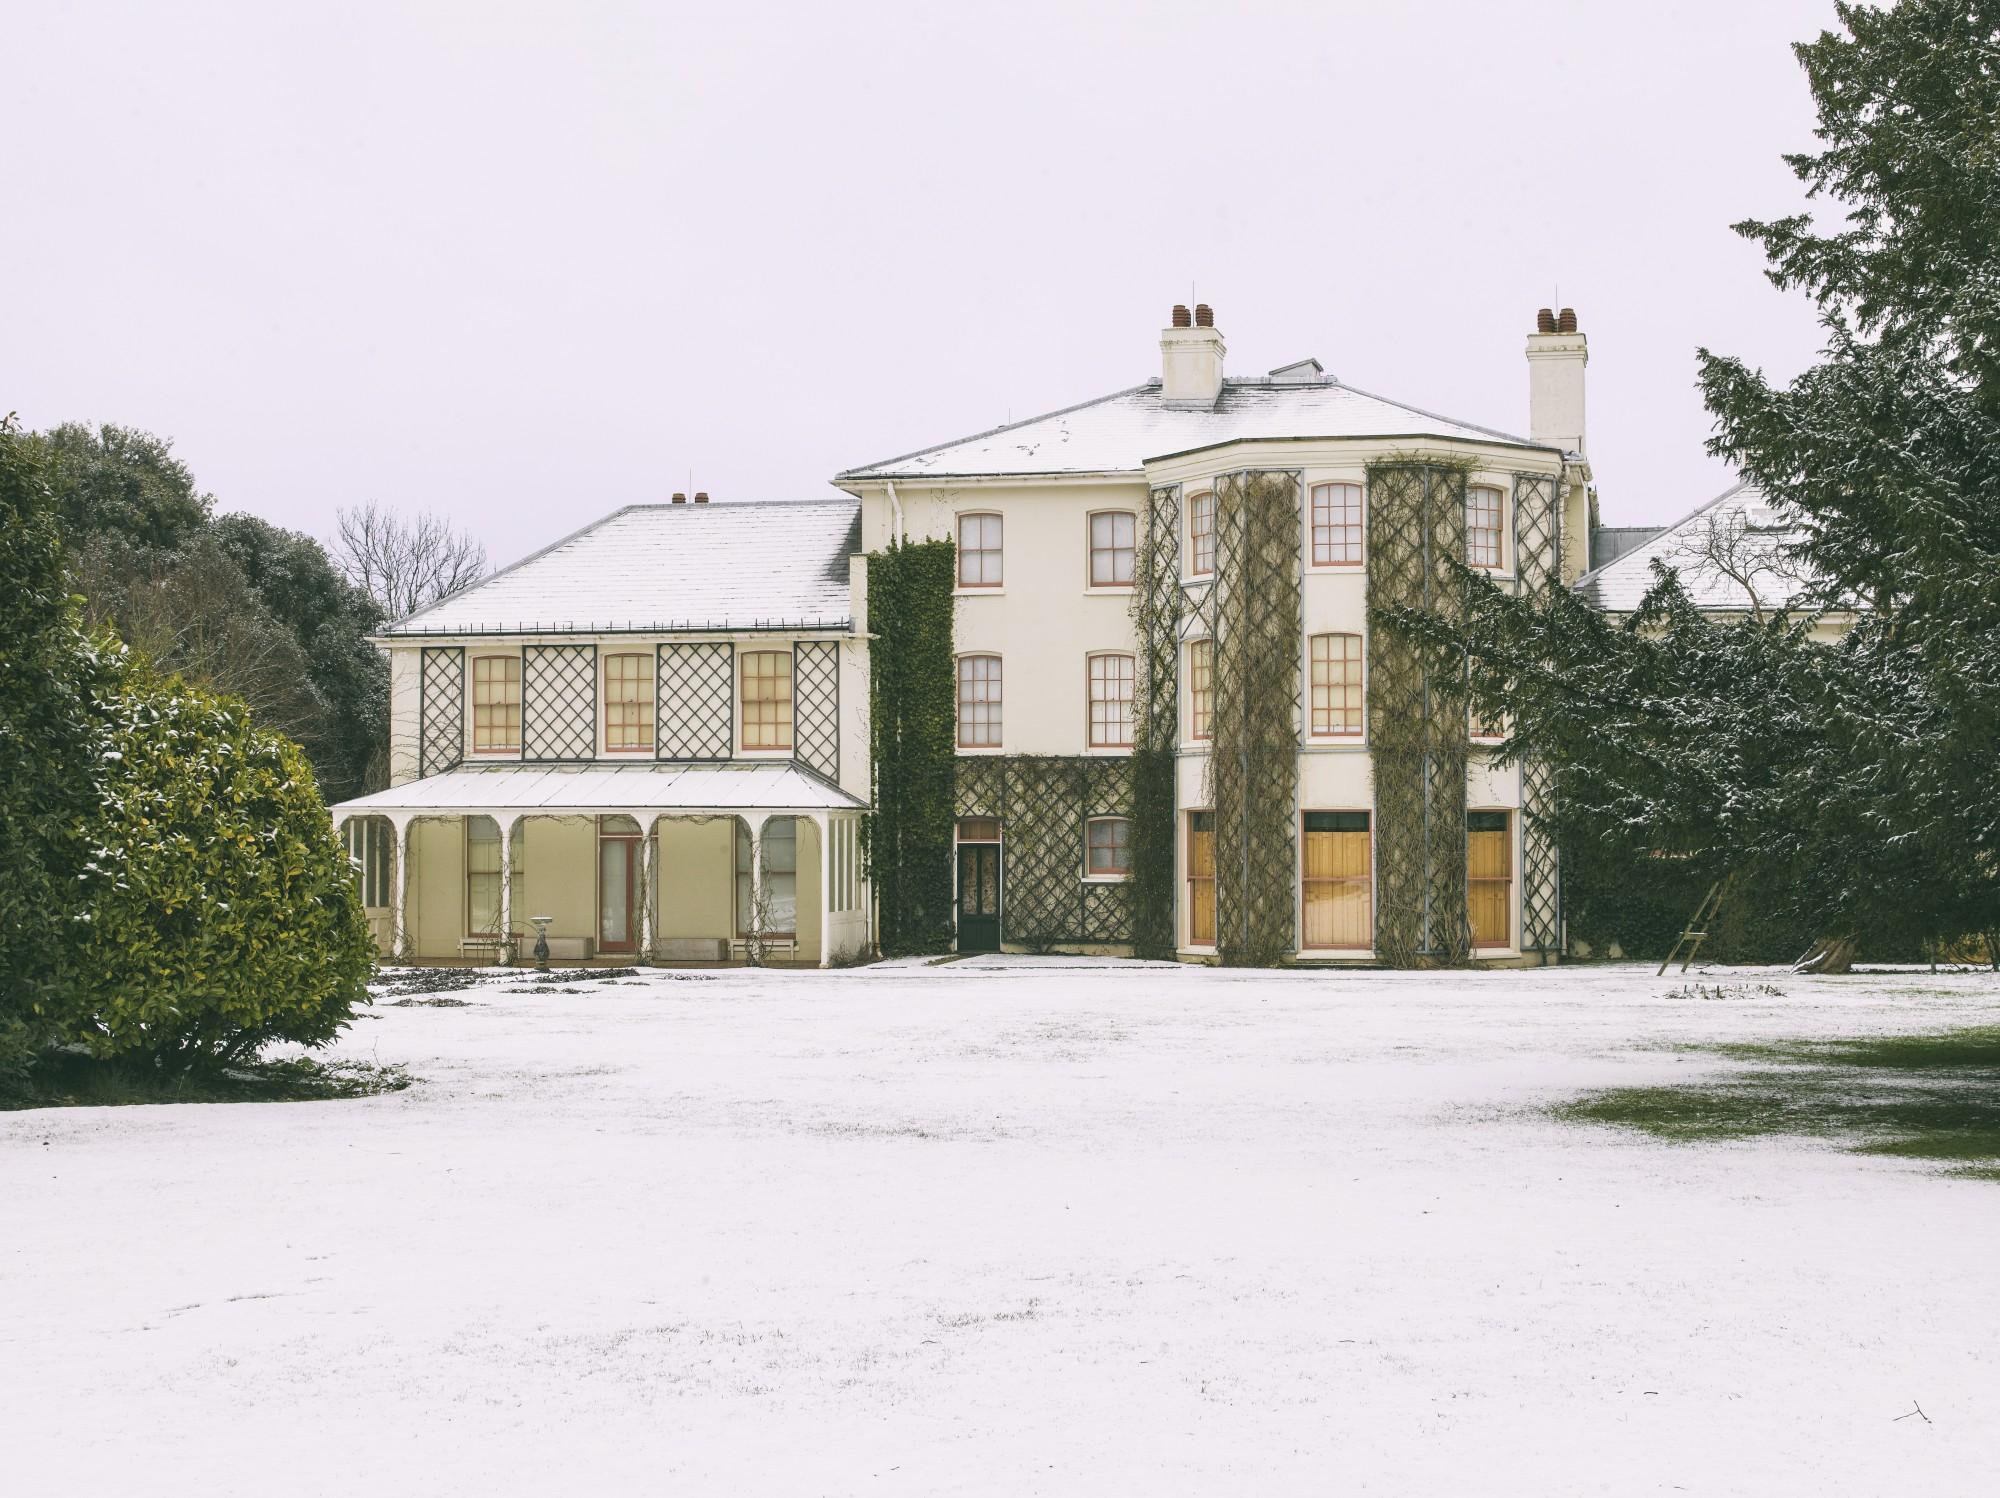 Snowy English Heritage house